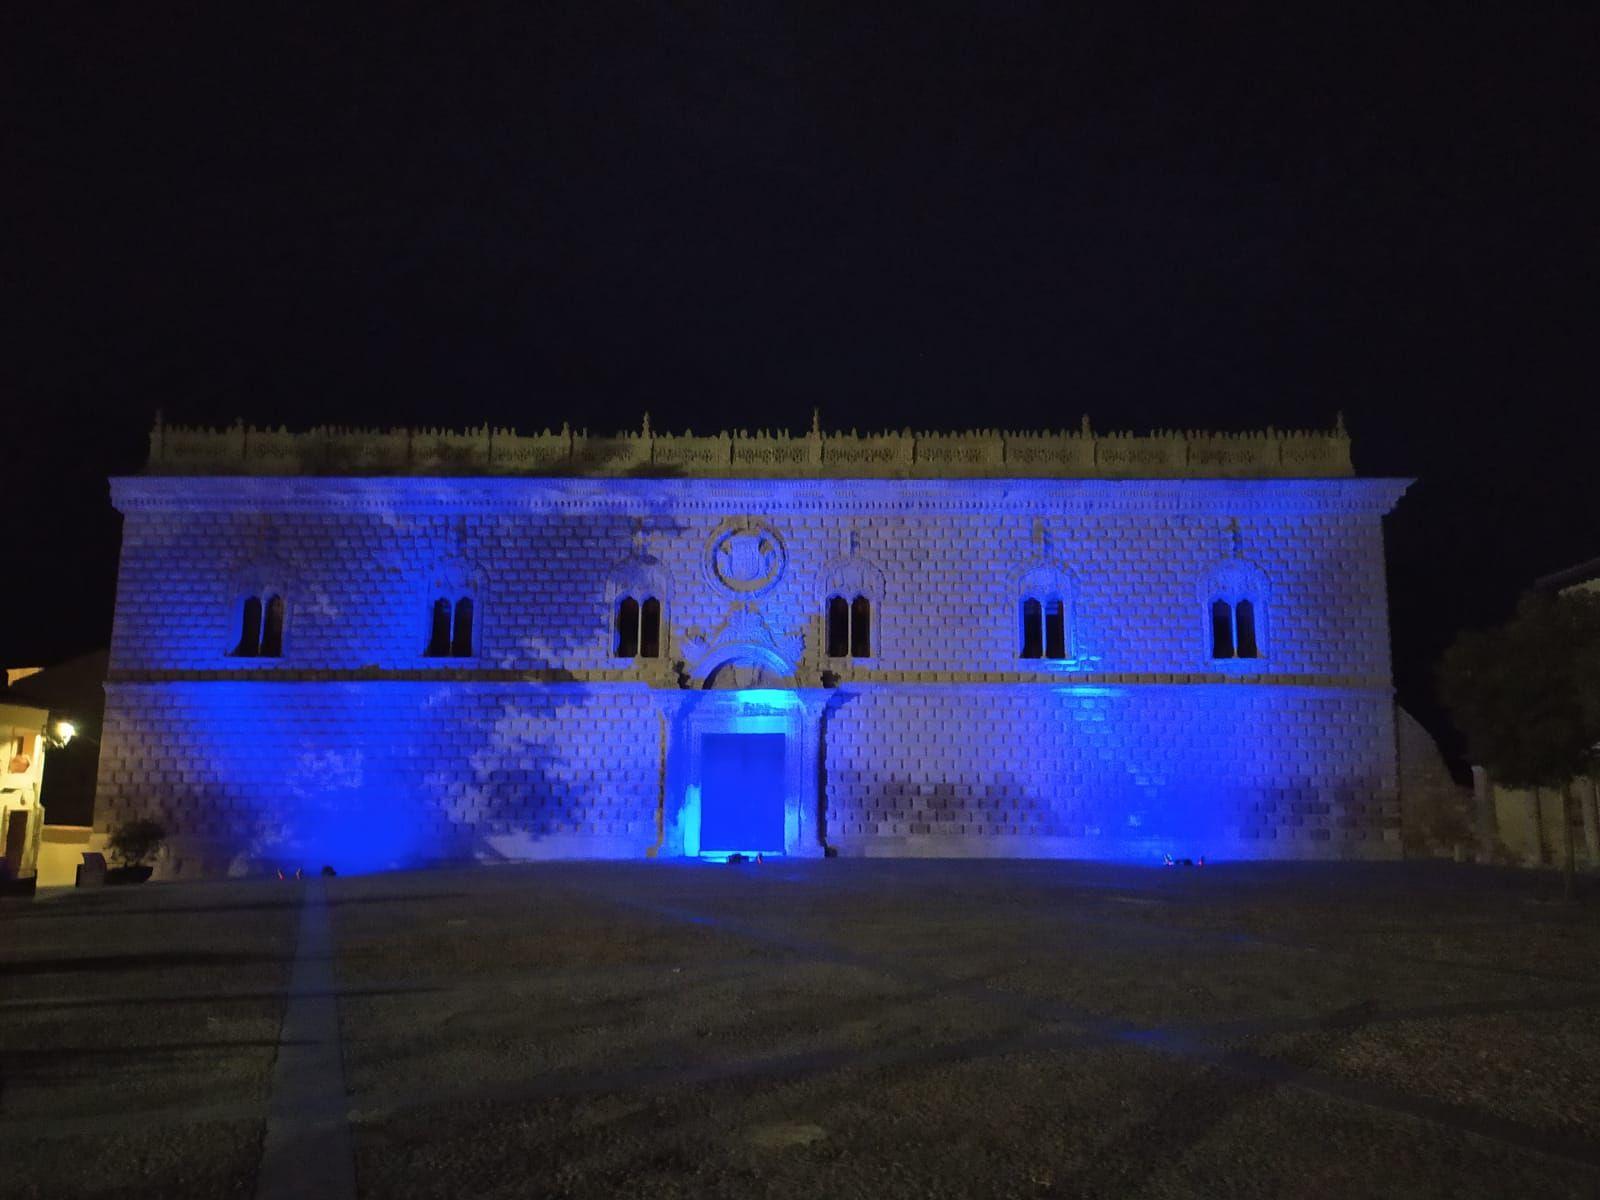 Foto de Palacio Duques Medinaceli, iluminado